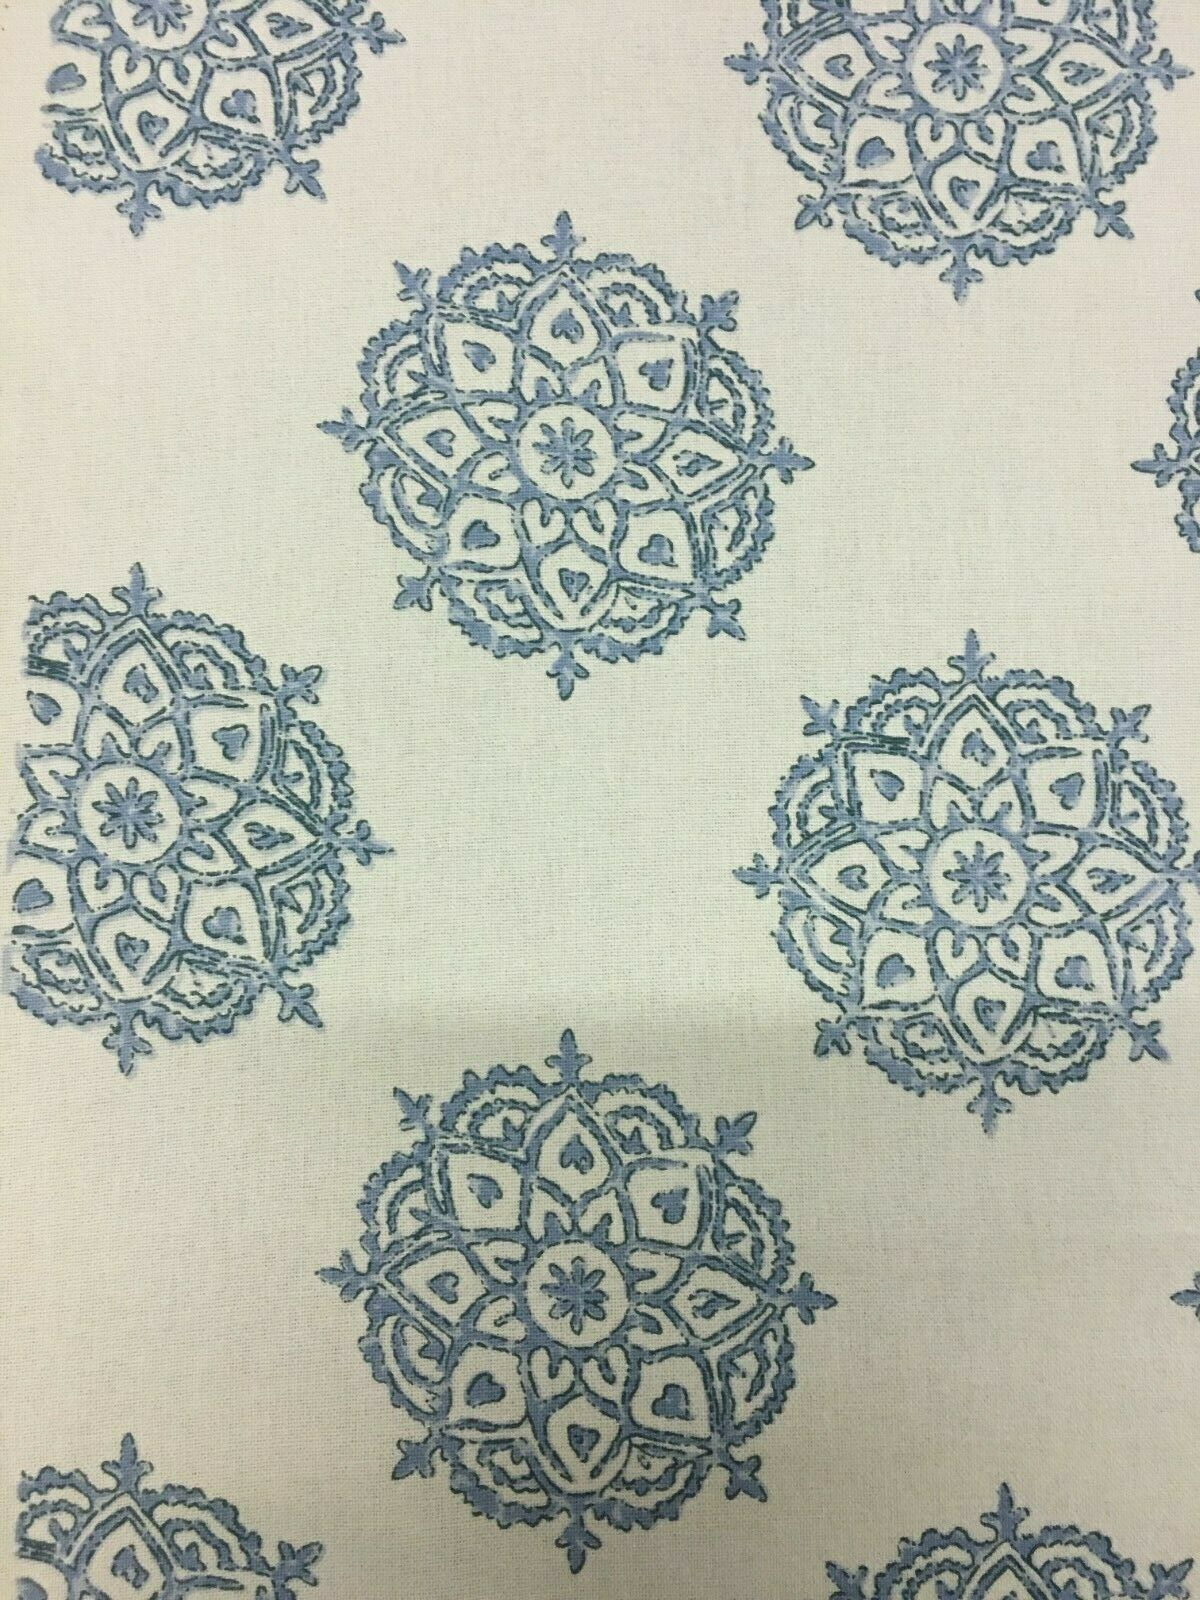 Laura & Kiran Tantra Handprint Blue 100% Cotton Multi-Purpose Fabric 4.125 yds